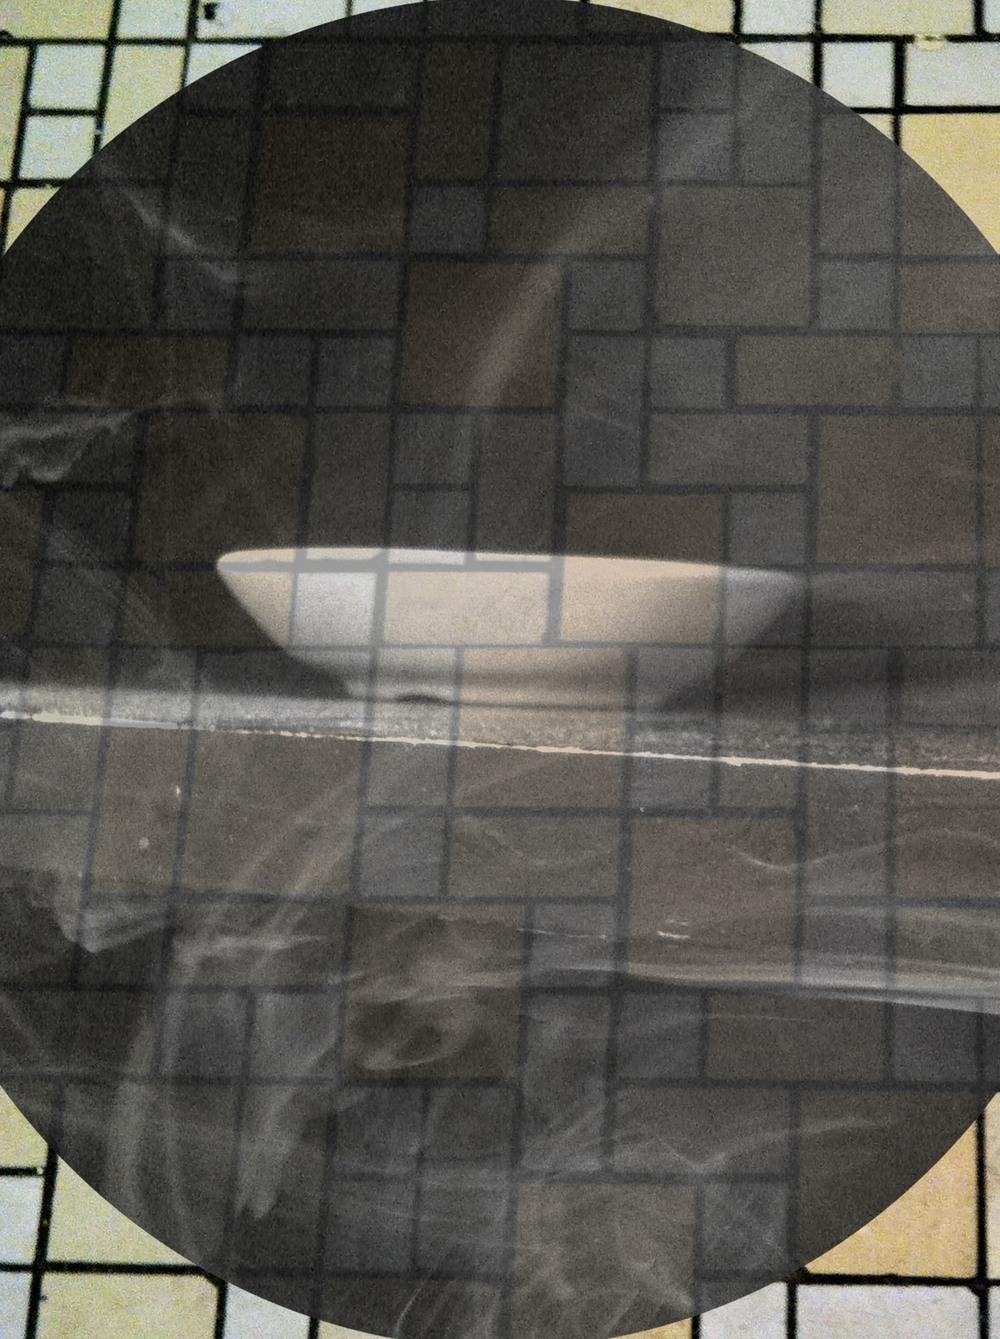 layeredfloorsmoke.jpg